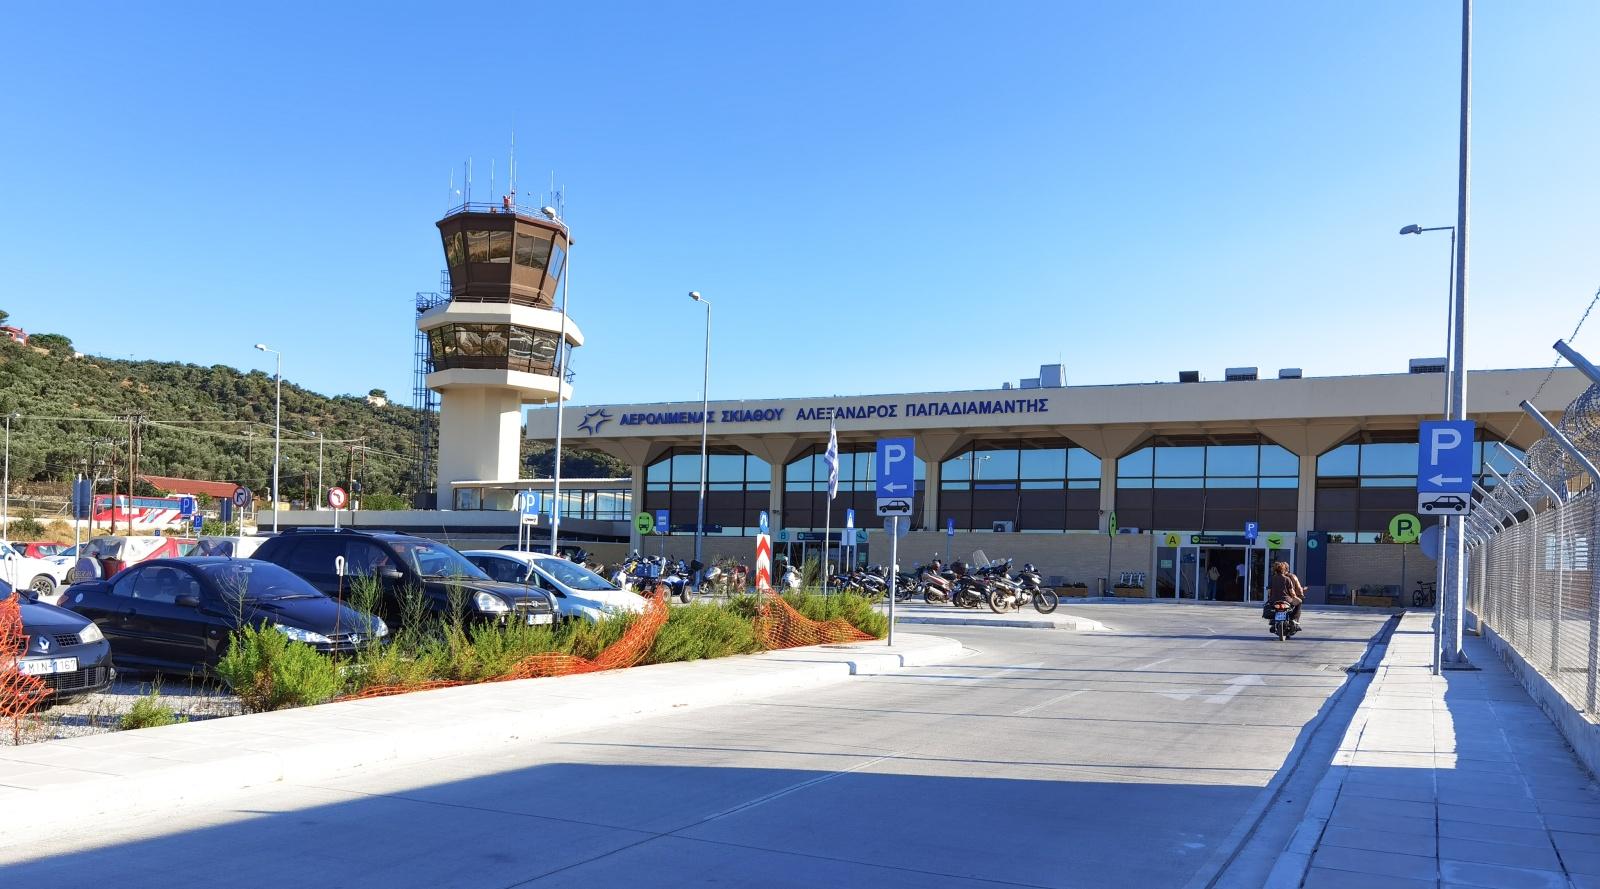 Skiathos Airport Terminal